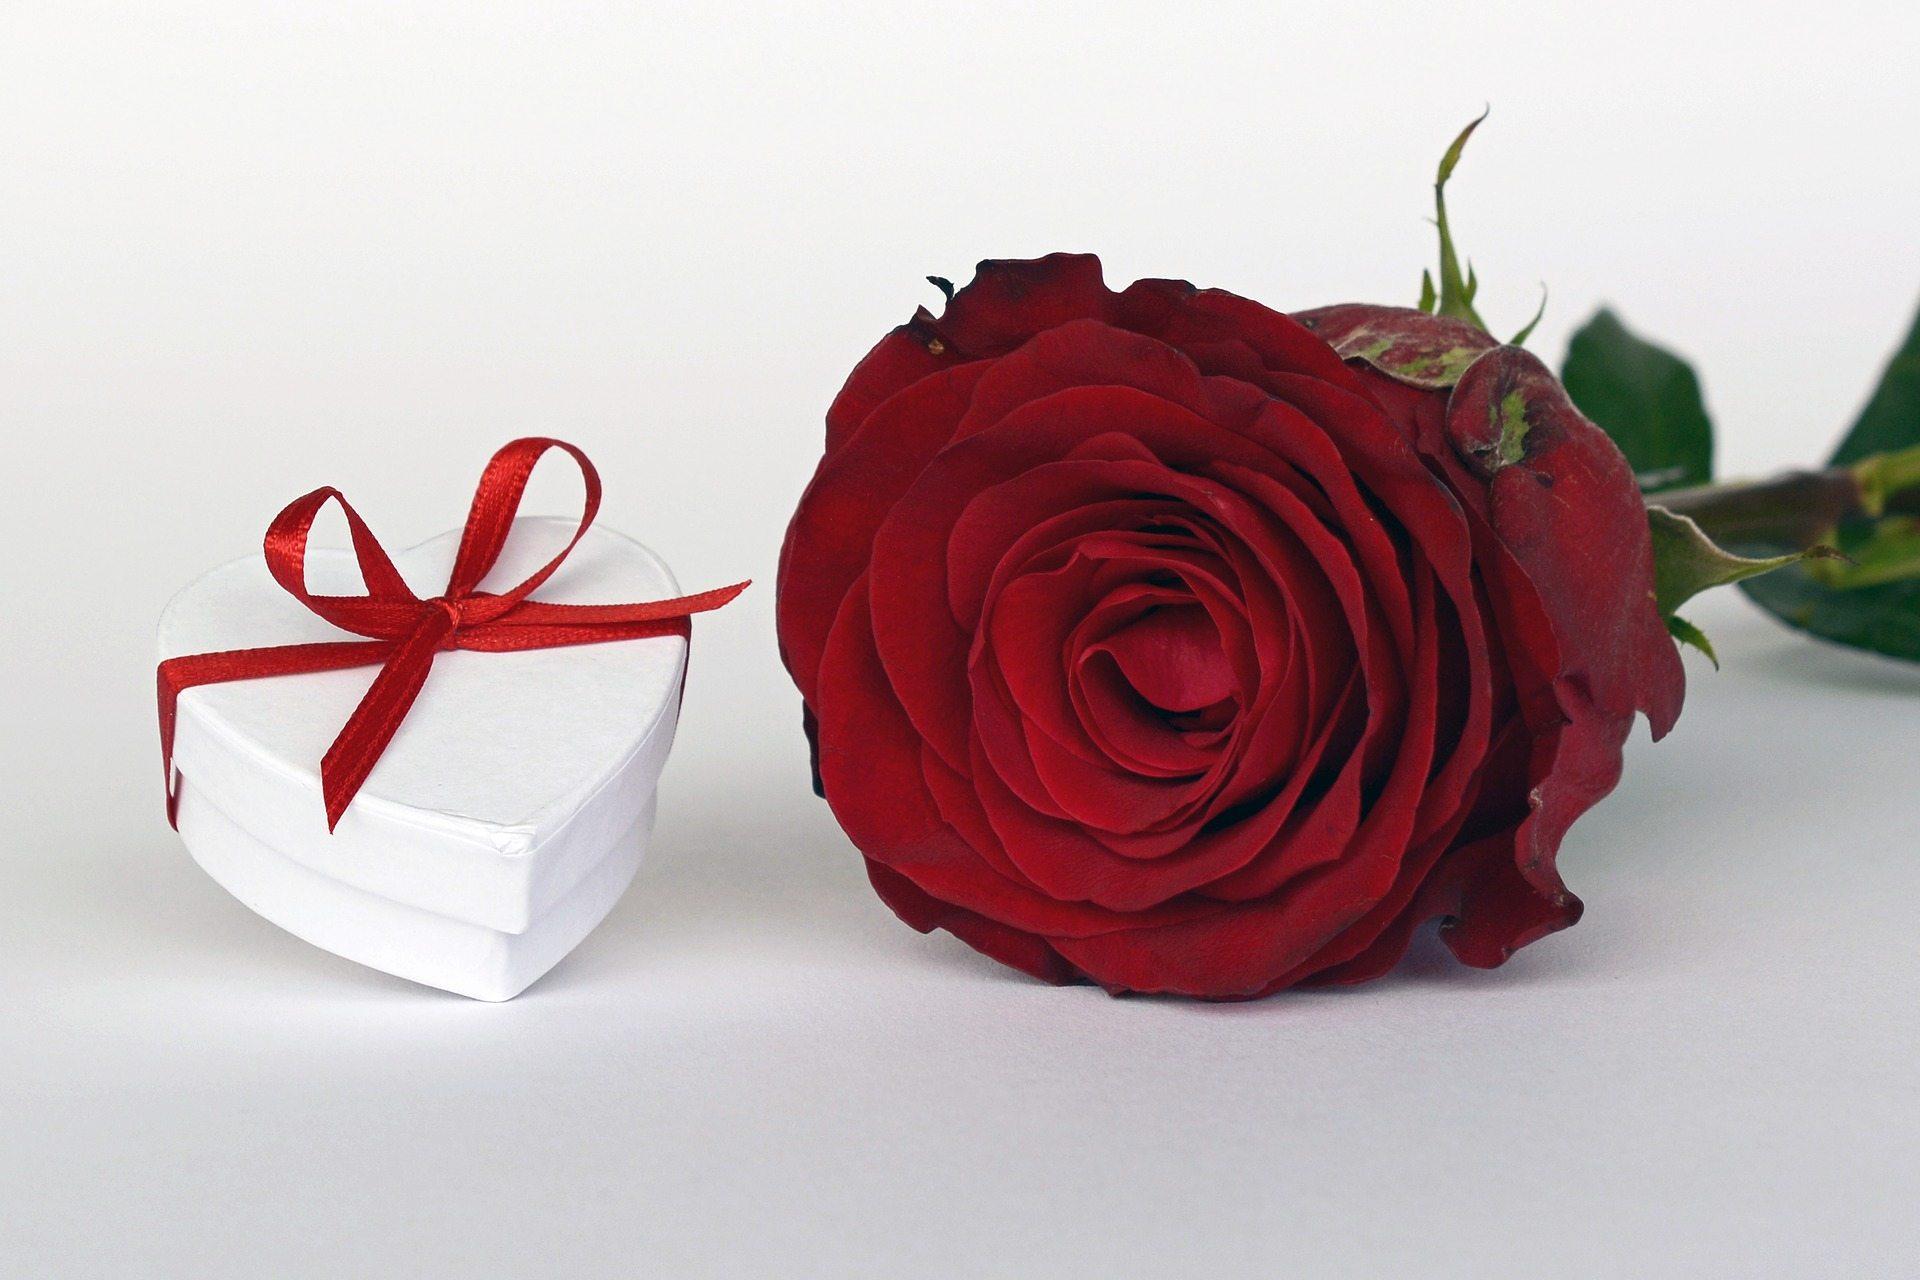 Valentines Pixabay rose-2019692_1920